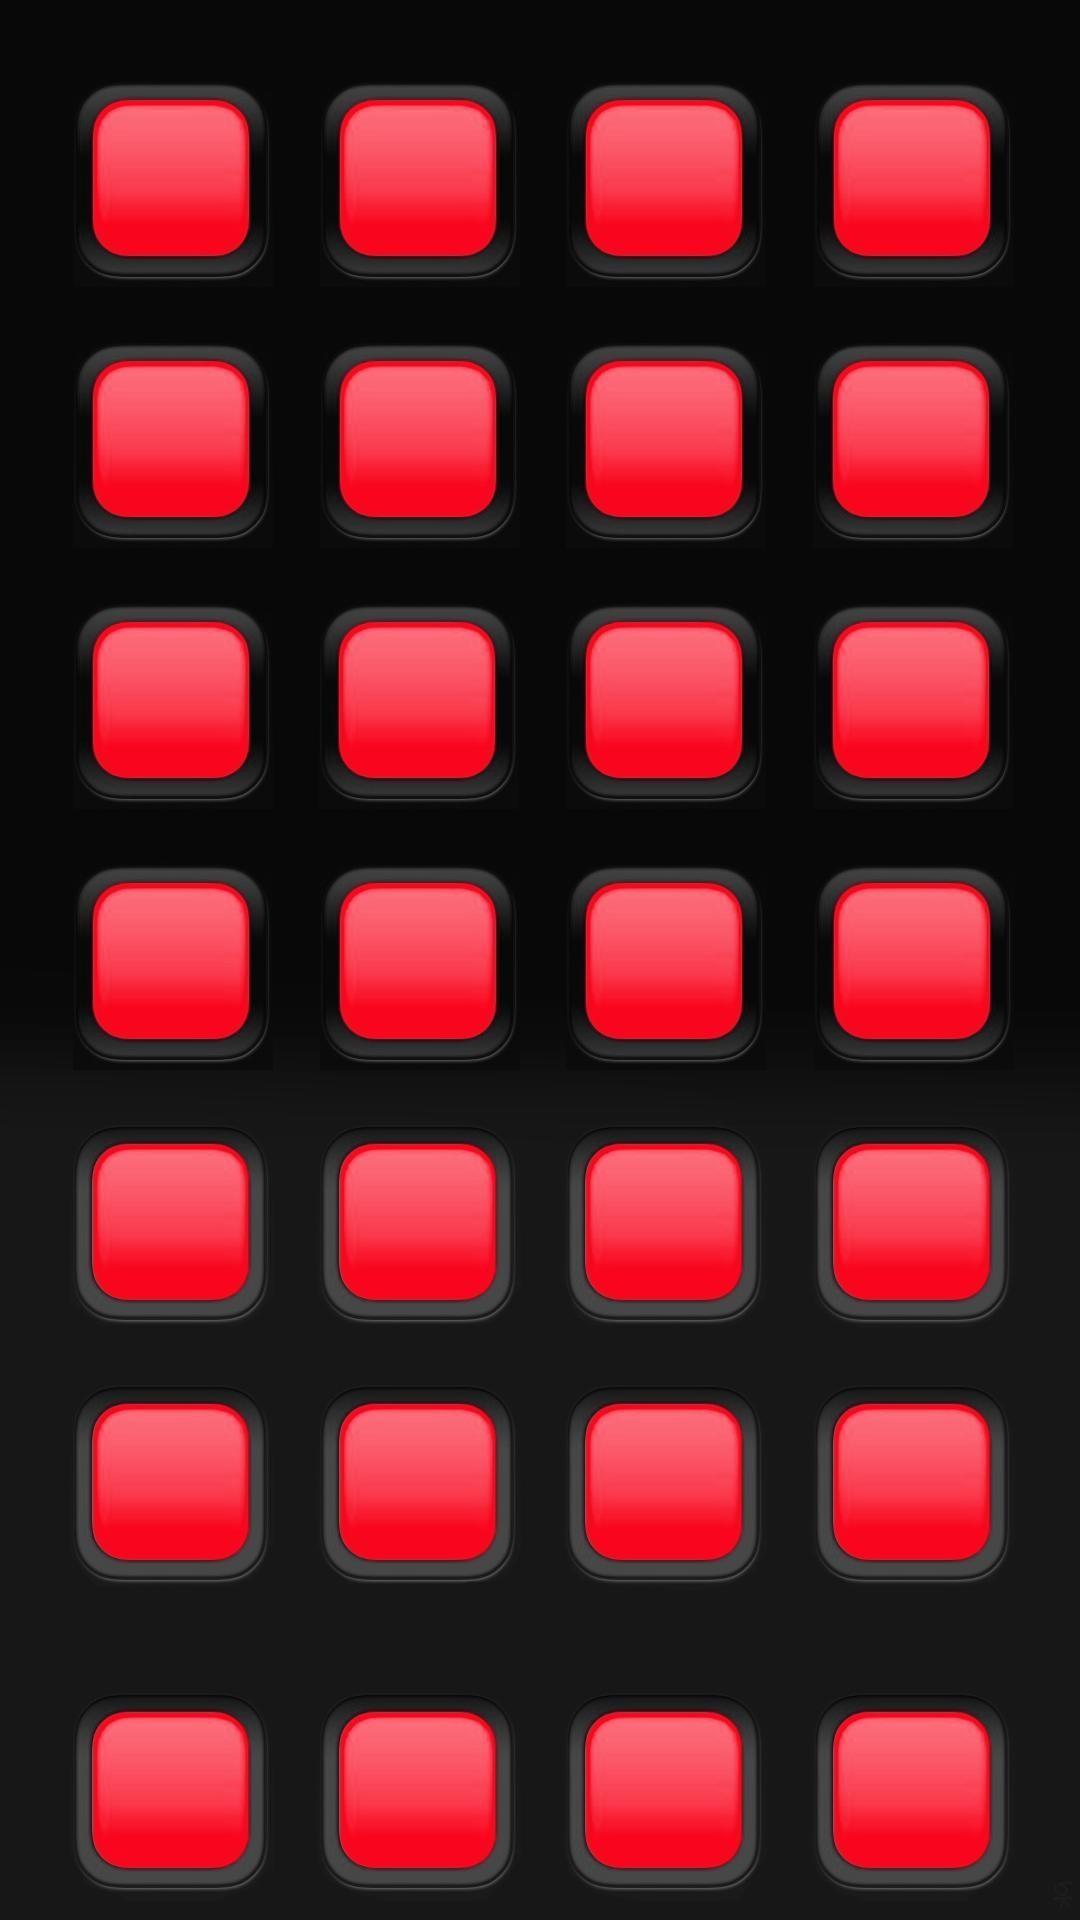 iPhone 7 Plus Wallpaper Homescreens plus black red squares